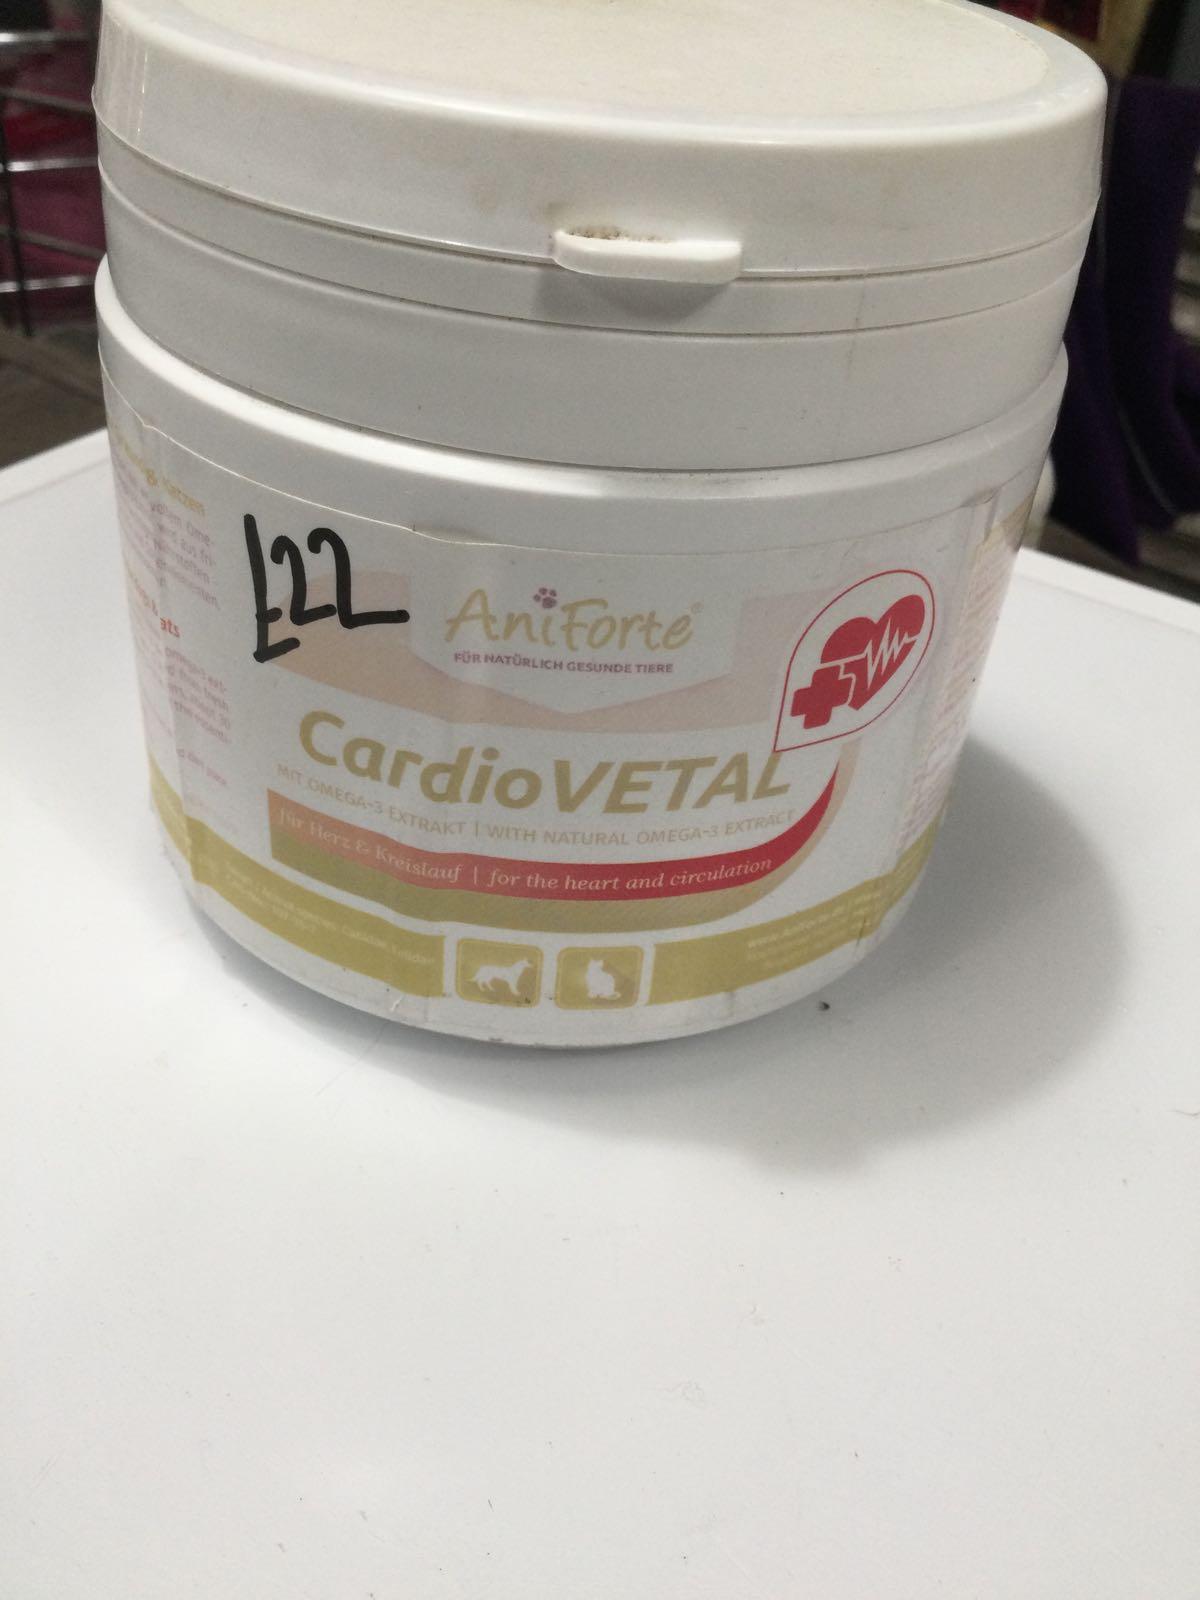 Aniforte cardiovetal